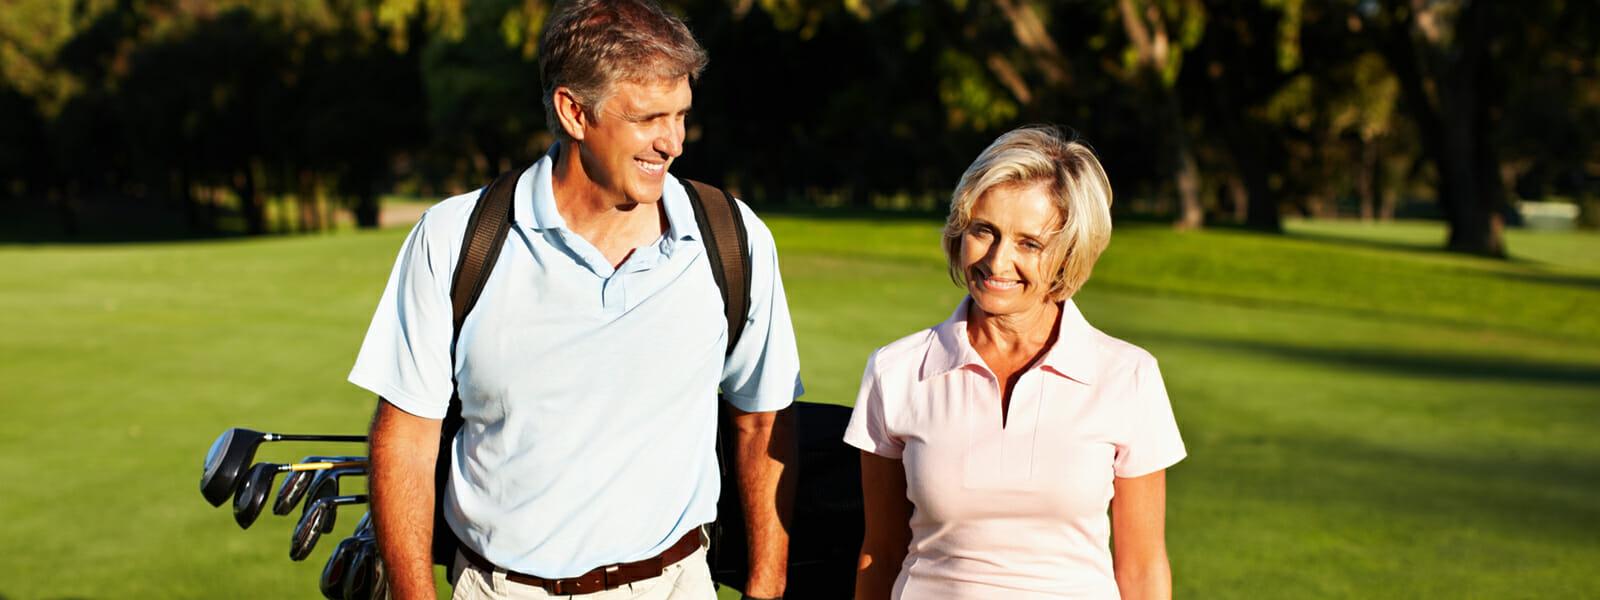 Golf Community near Charlottesville VA | Spring Creek | Low Taxes